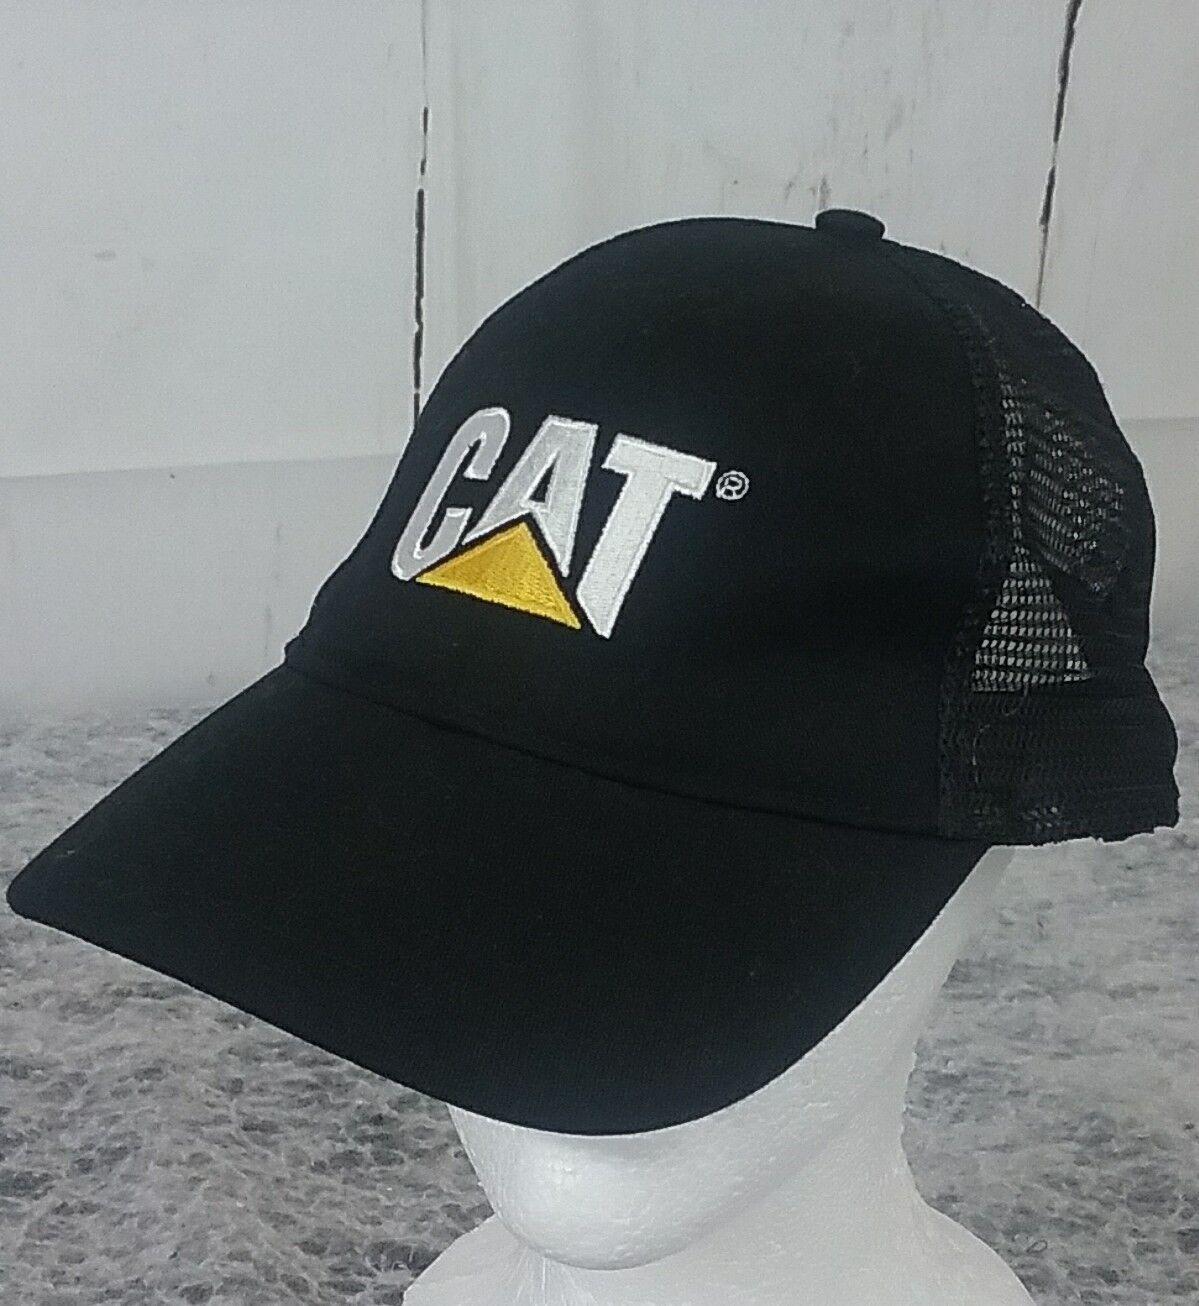 buy online 2978f ce724 promo code cat mesh hat snapback trucker caterpillar black hat mesh cap  59975b 68831 adb00